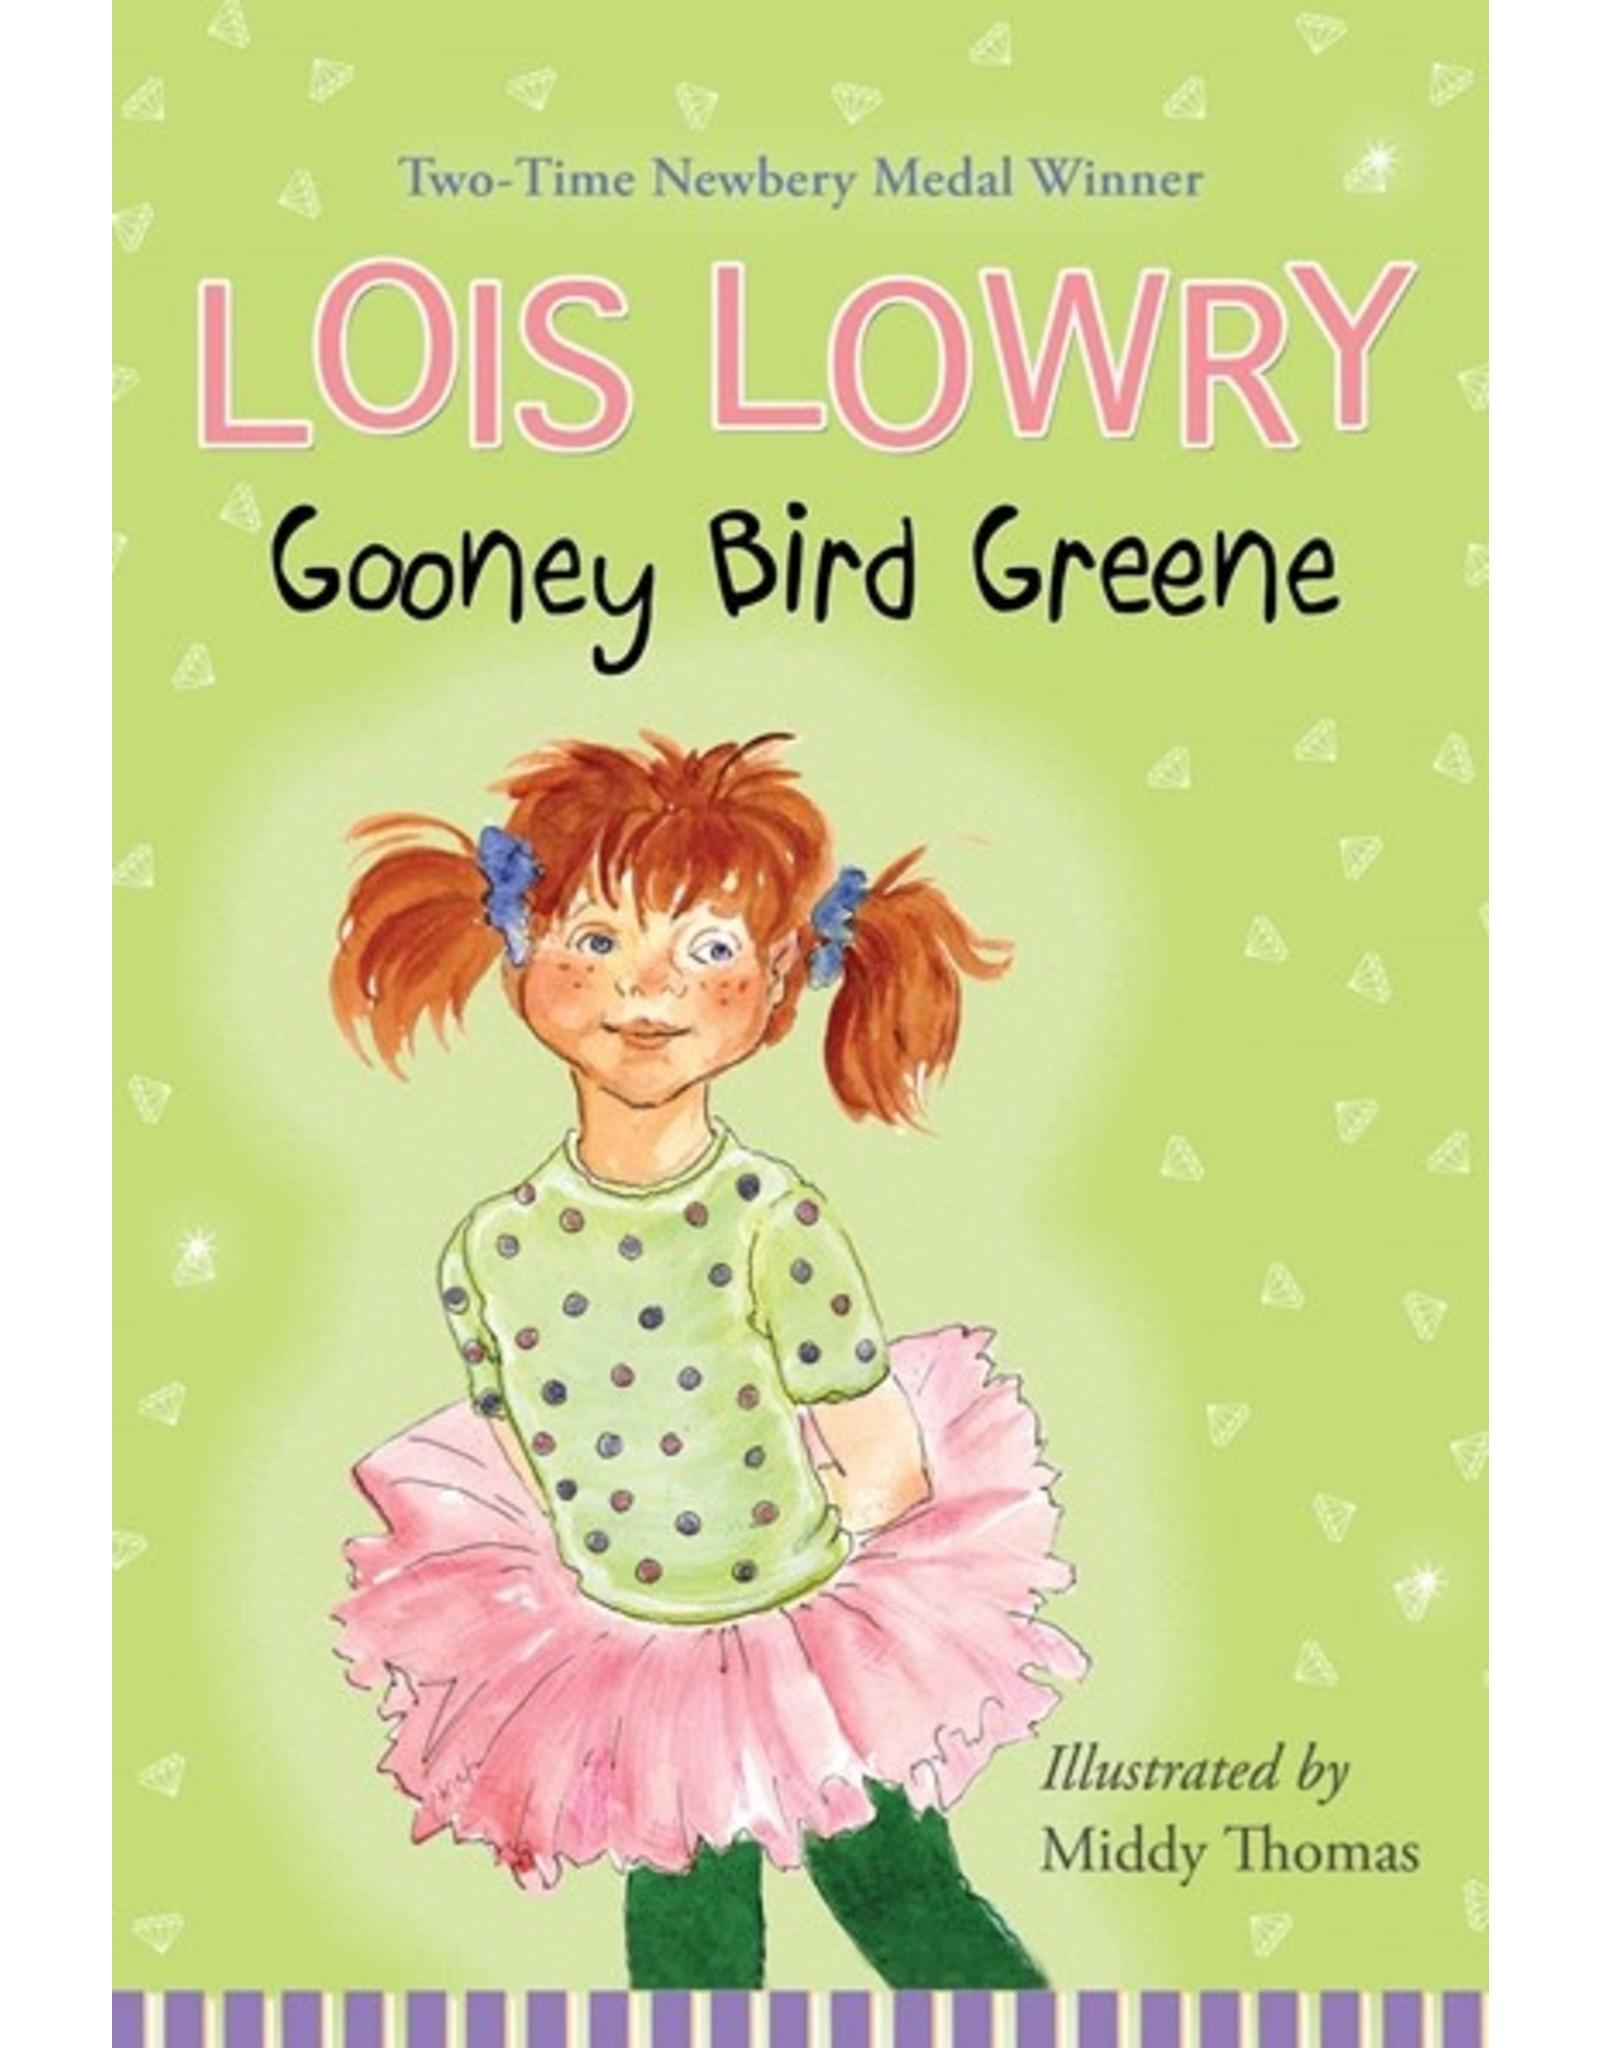 Books Gooney Bird Greene by Lois Lowry (summerbookclub)